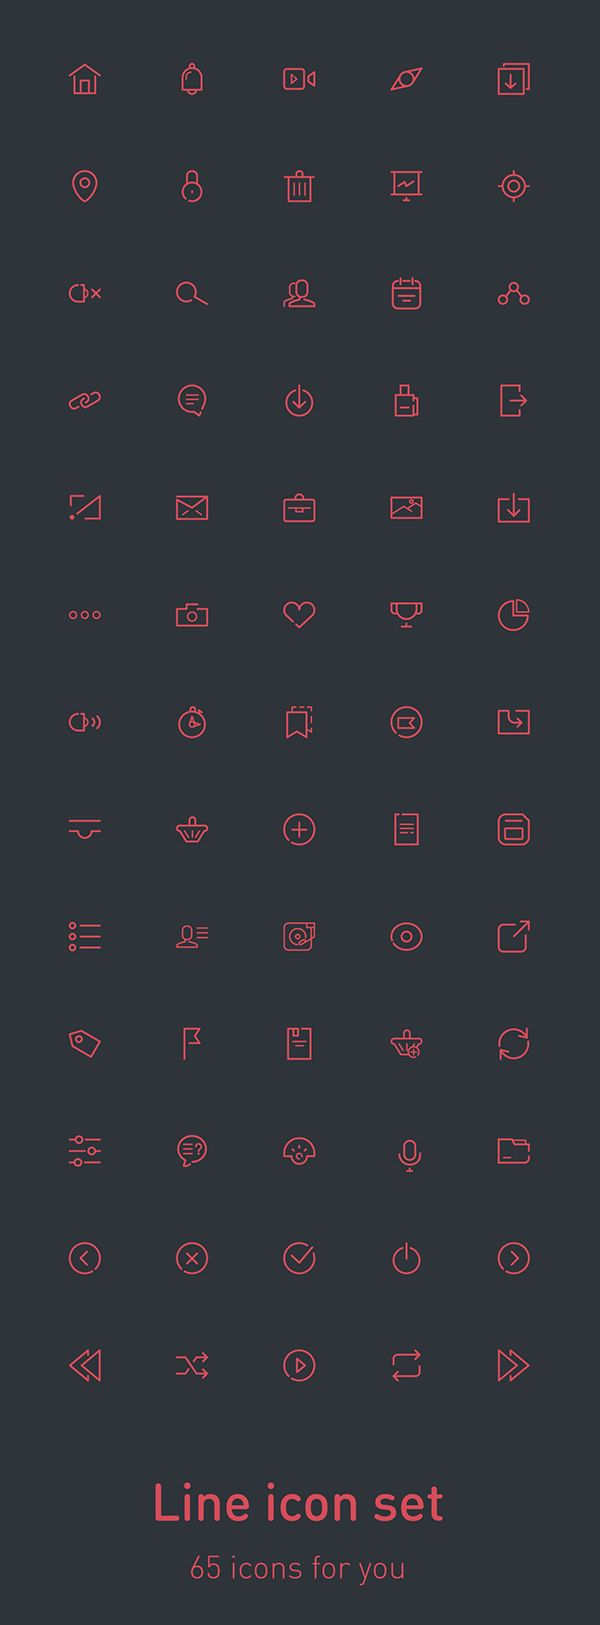 65 free icons on Behance